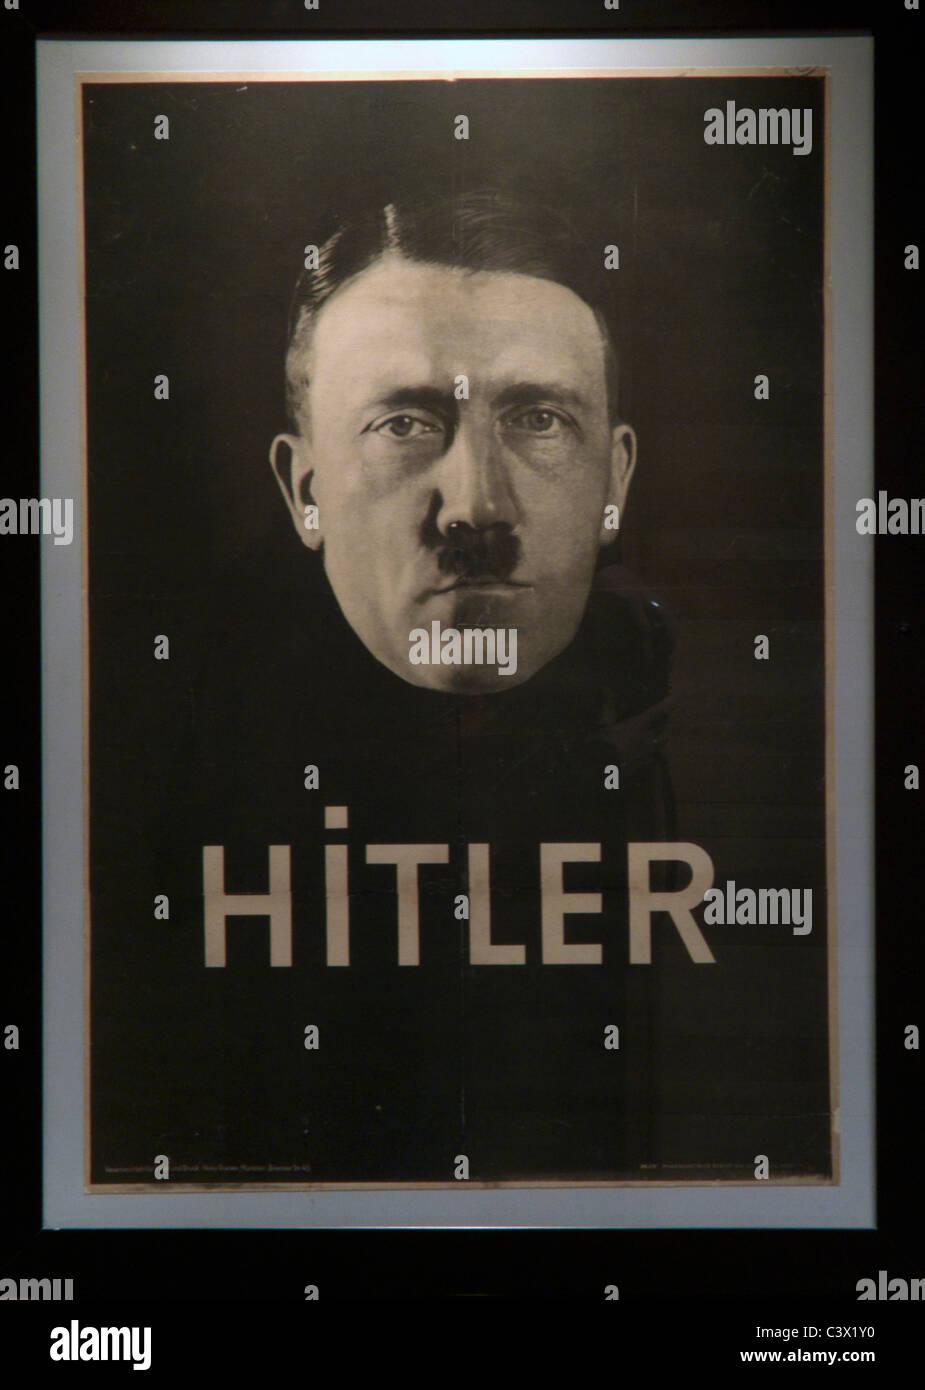 Hitler poster poster of Adolf Hitler pre-war - Stock Image